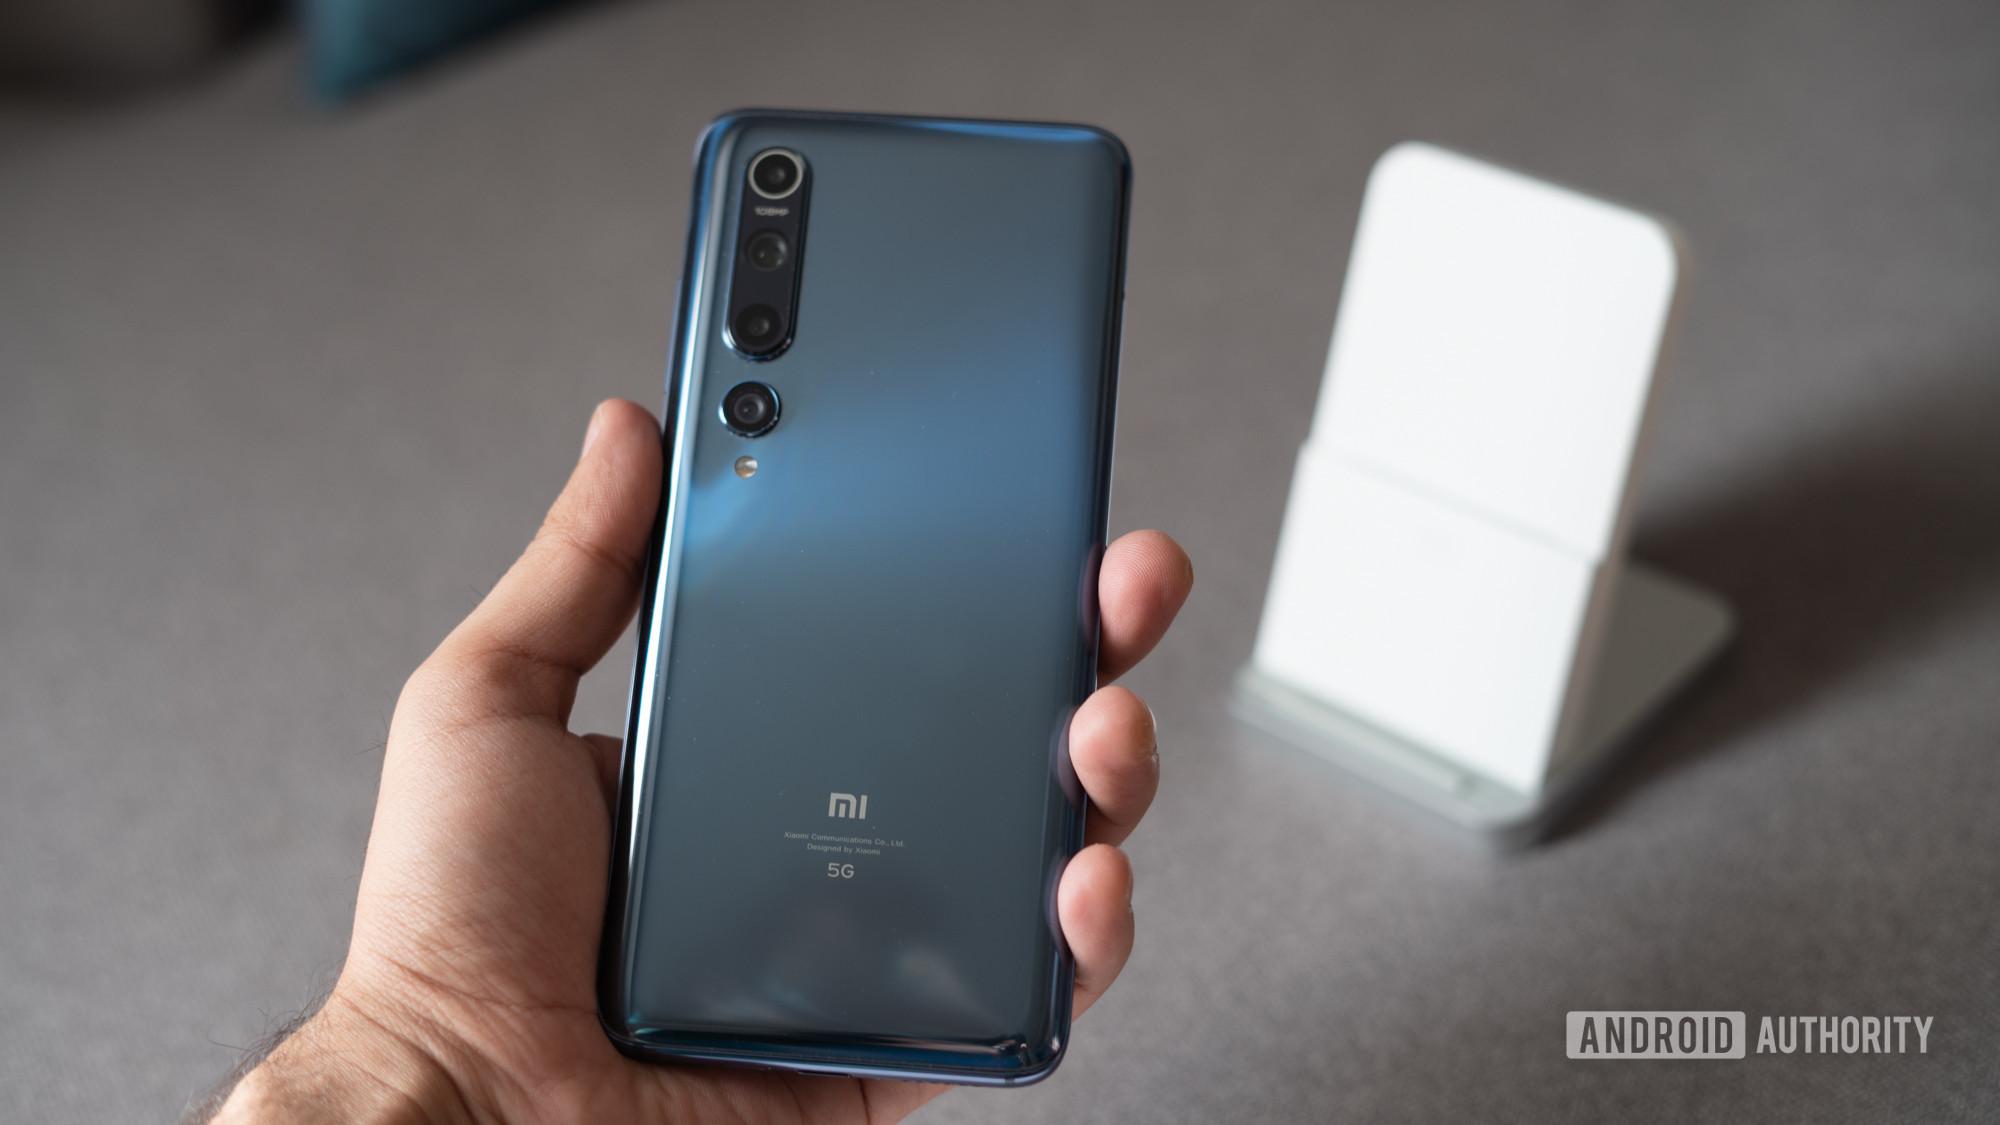 Xiaomi Mi 10 in hand with charging dock